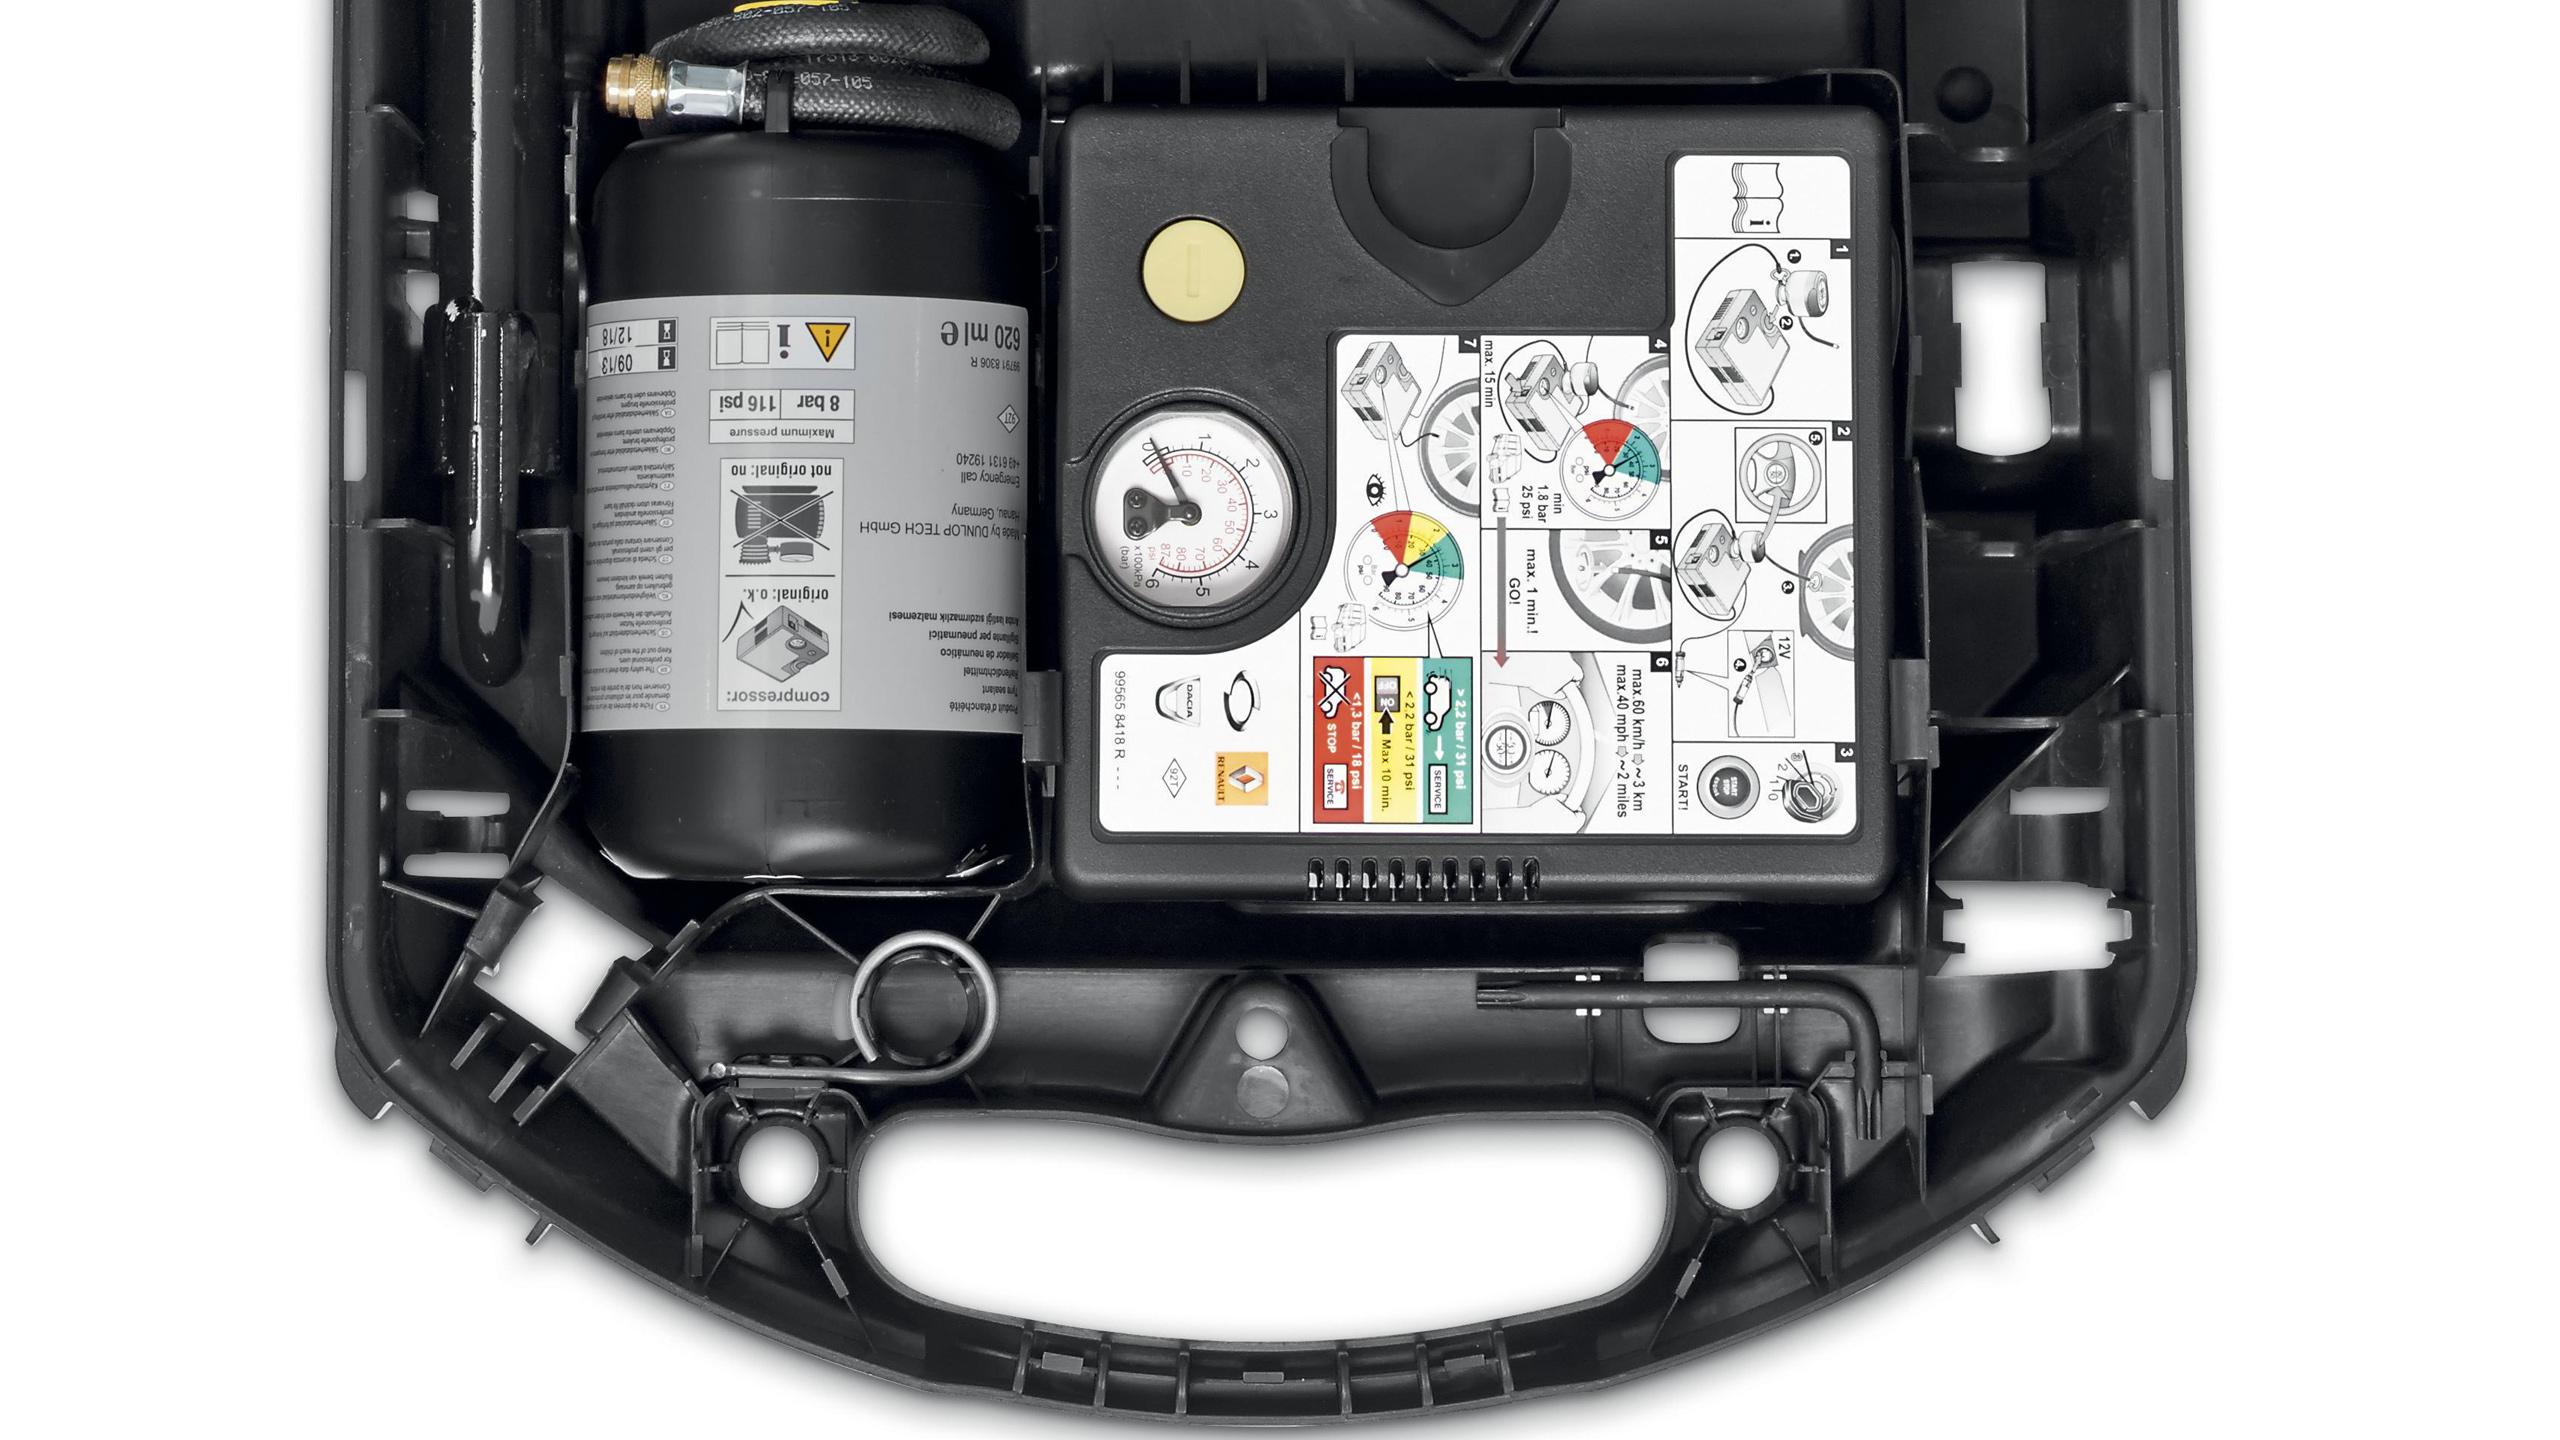 Kit de enchimento de pneus